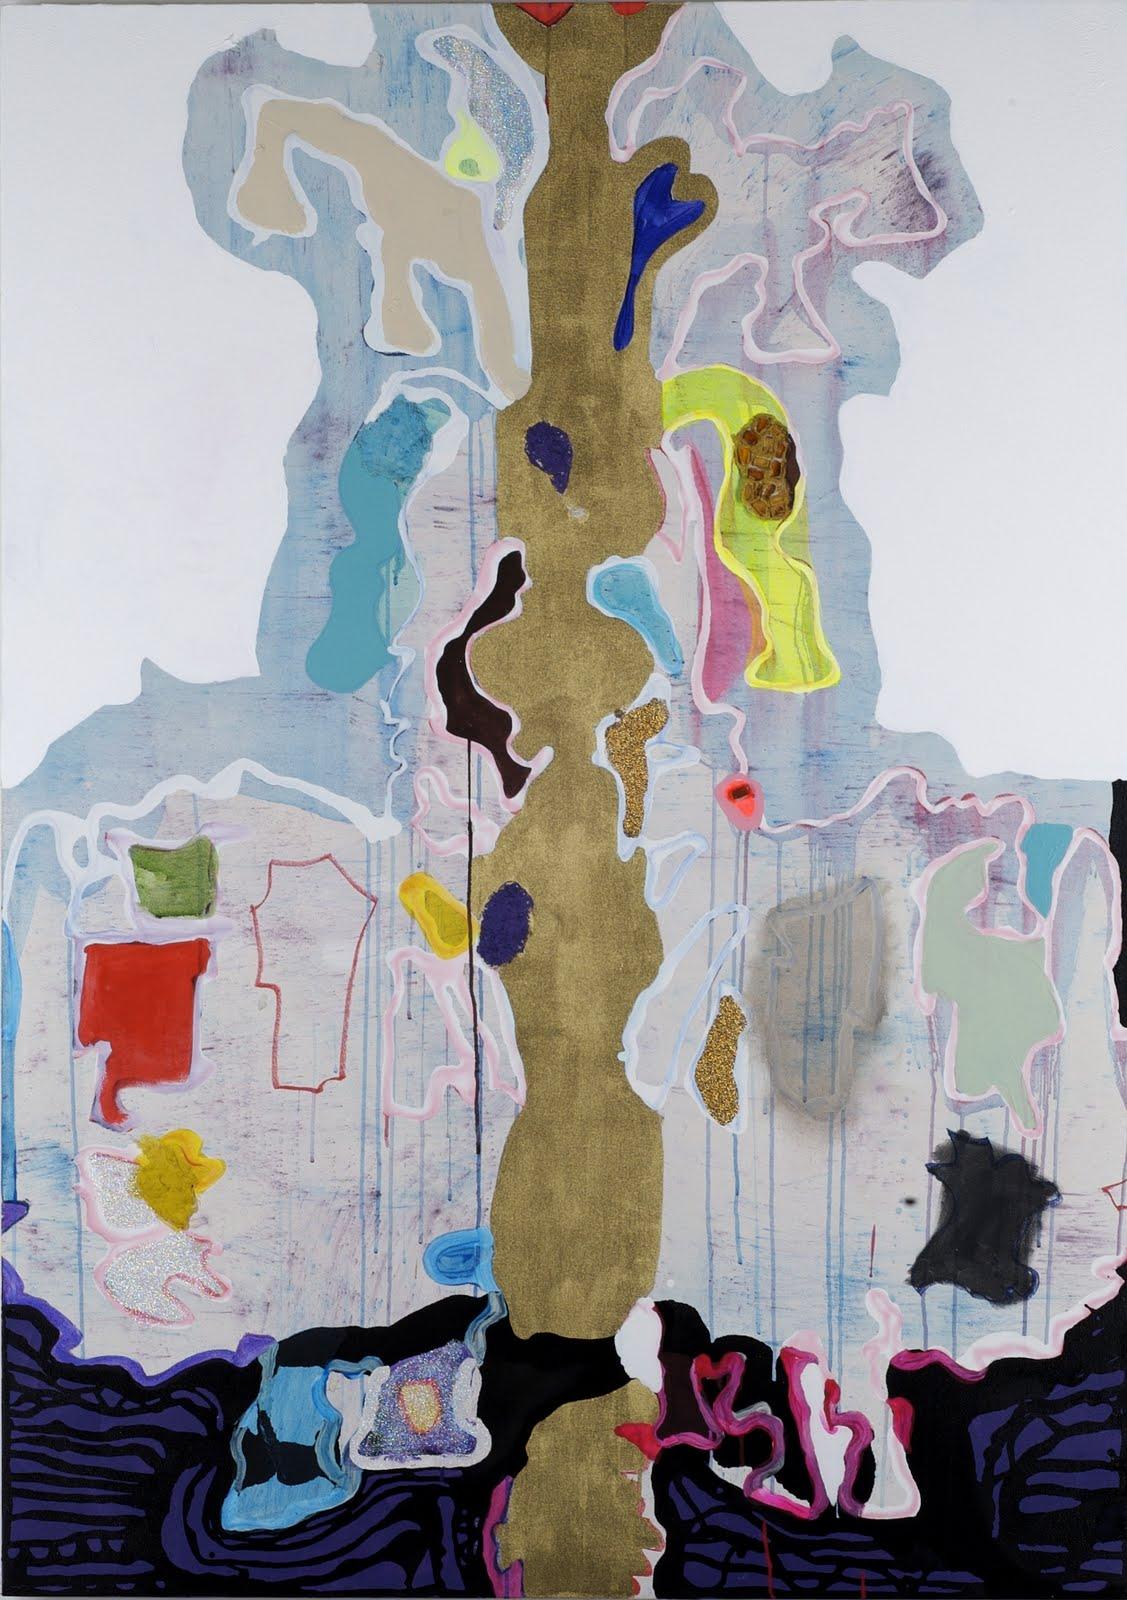 http://2.bp.blogspot.com/-wow0A8h1fRM/Td1KEYdJirI/AAAAAAAAAx8/ljkjS-Res74/s1600/Laurel%252BSparks-Princess%252BCoo%252BCoo-2007-Acrylic-marble%252Bdust-paper%252Bmache-enamel-Venetian%252Bglass-watercolor%252Bmarker-pigment-unpainted%252Bcanvas-65x46.jpg